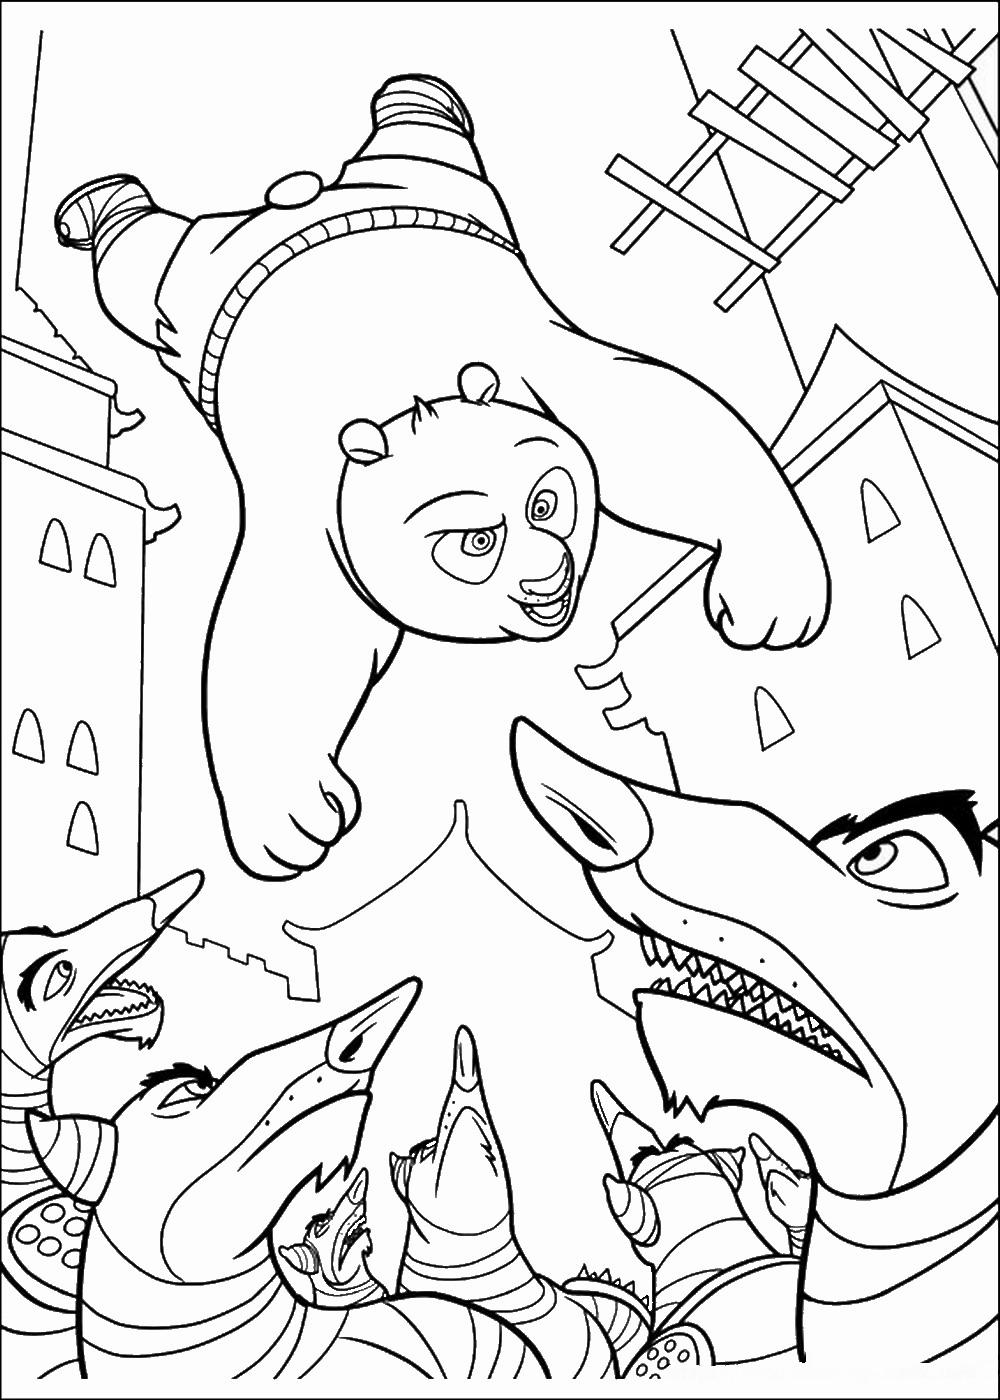 Kung Fu Panda Coloring Pages | Birthday Printable